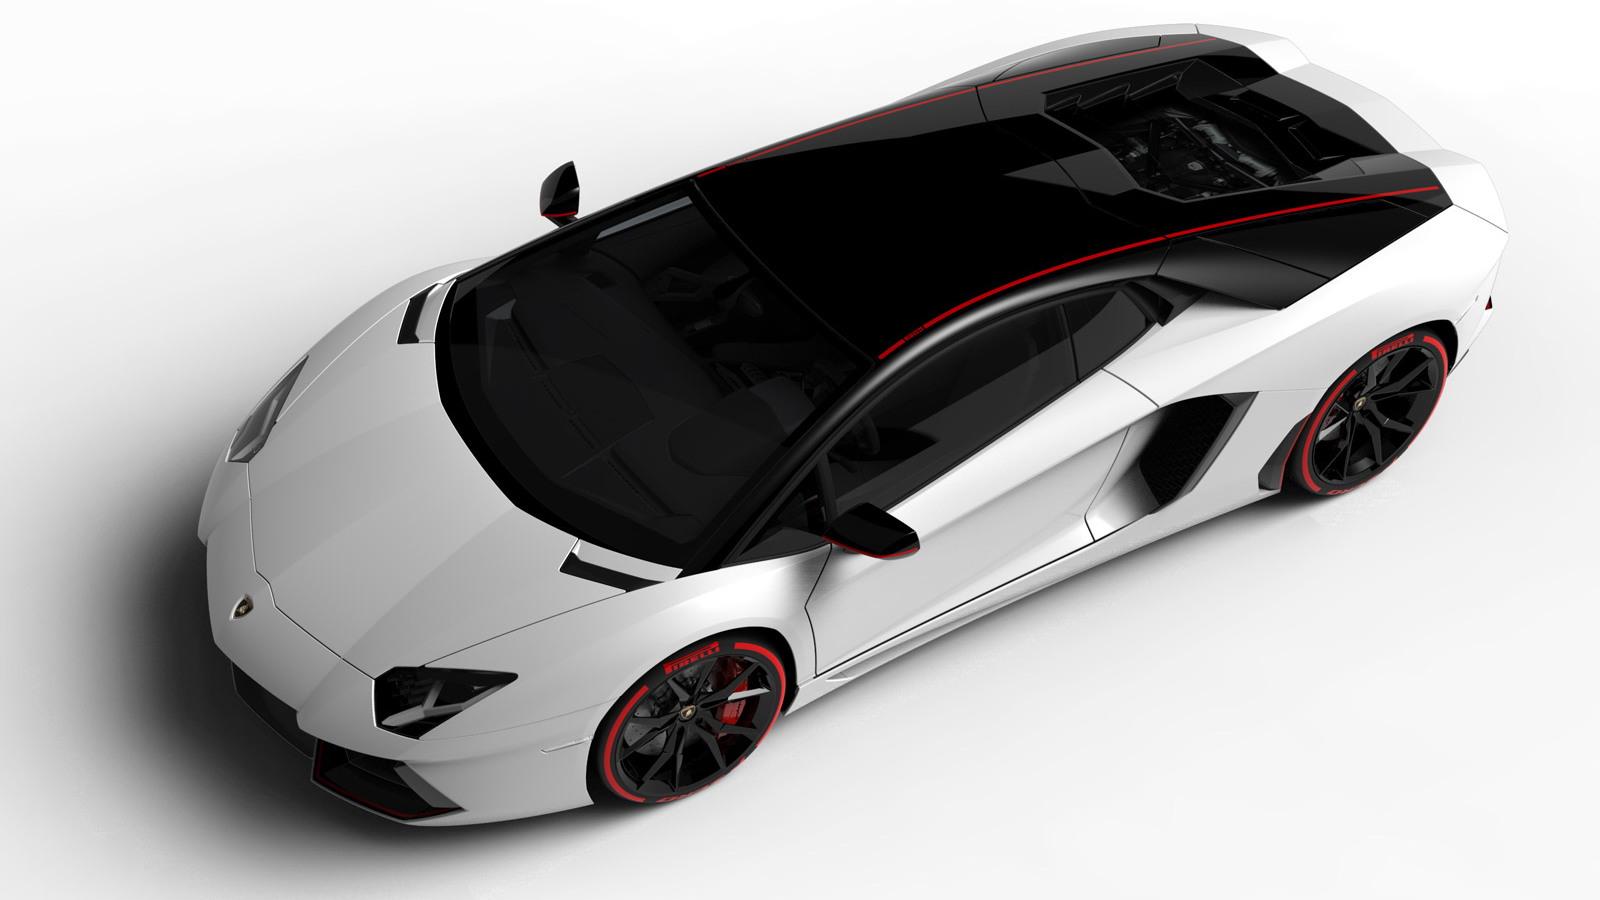 2015 Lamborghini Aventador LP 700-4 Pirelli Edition